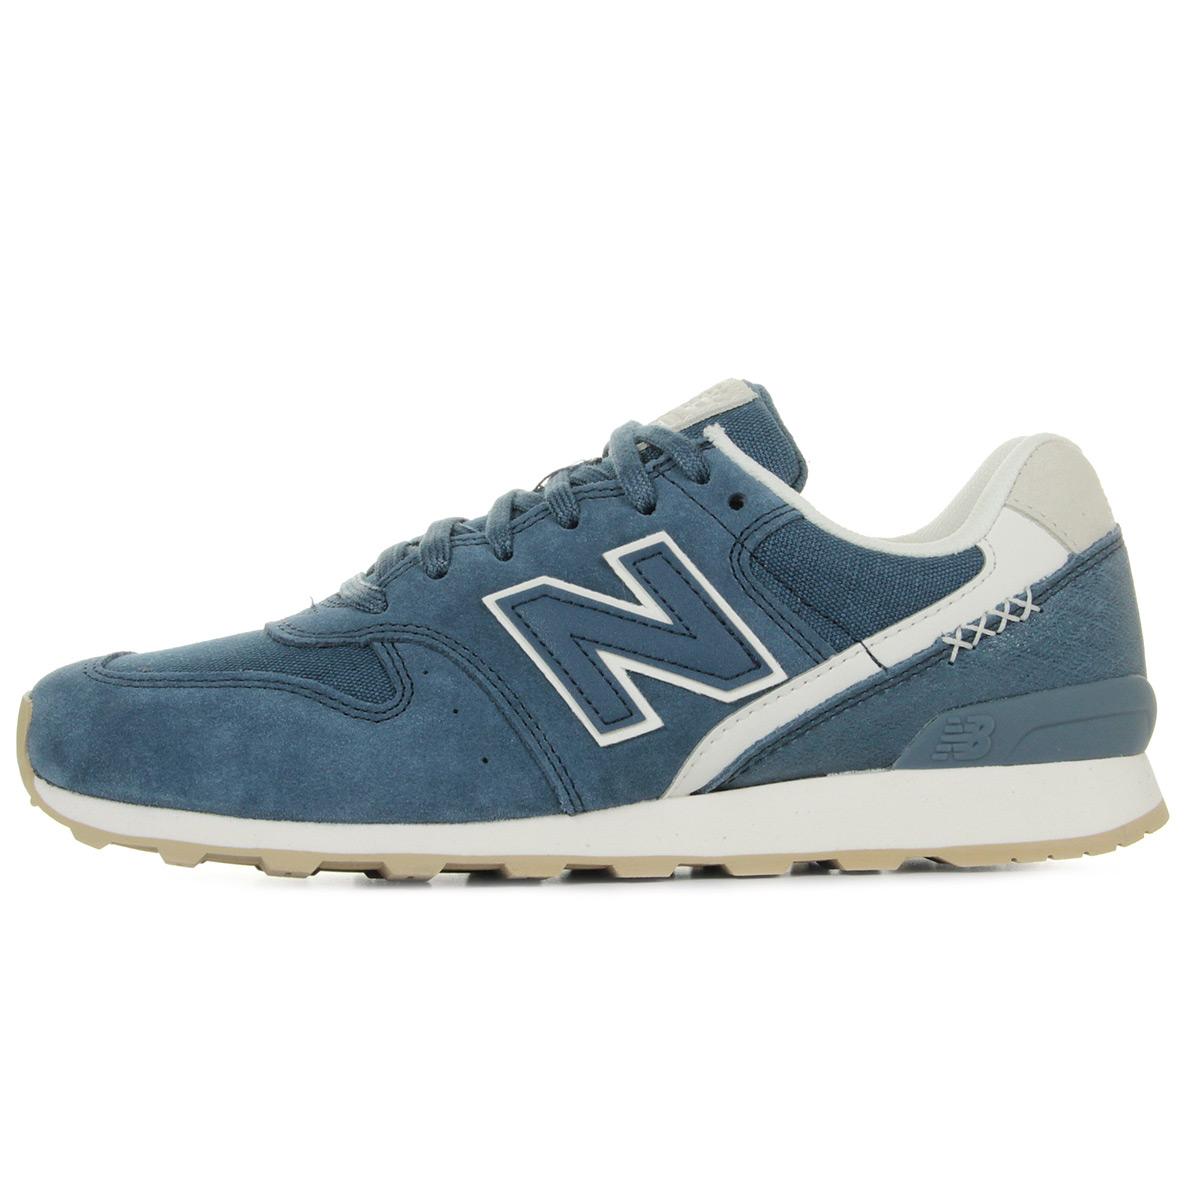 "New Balance 996 ""Vintage Indigo"" WR996BN, Baskets mode femme"